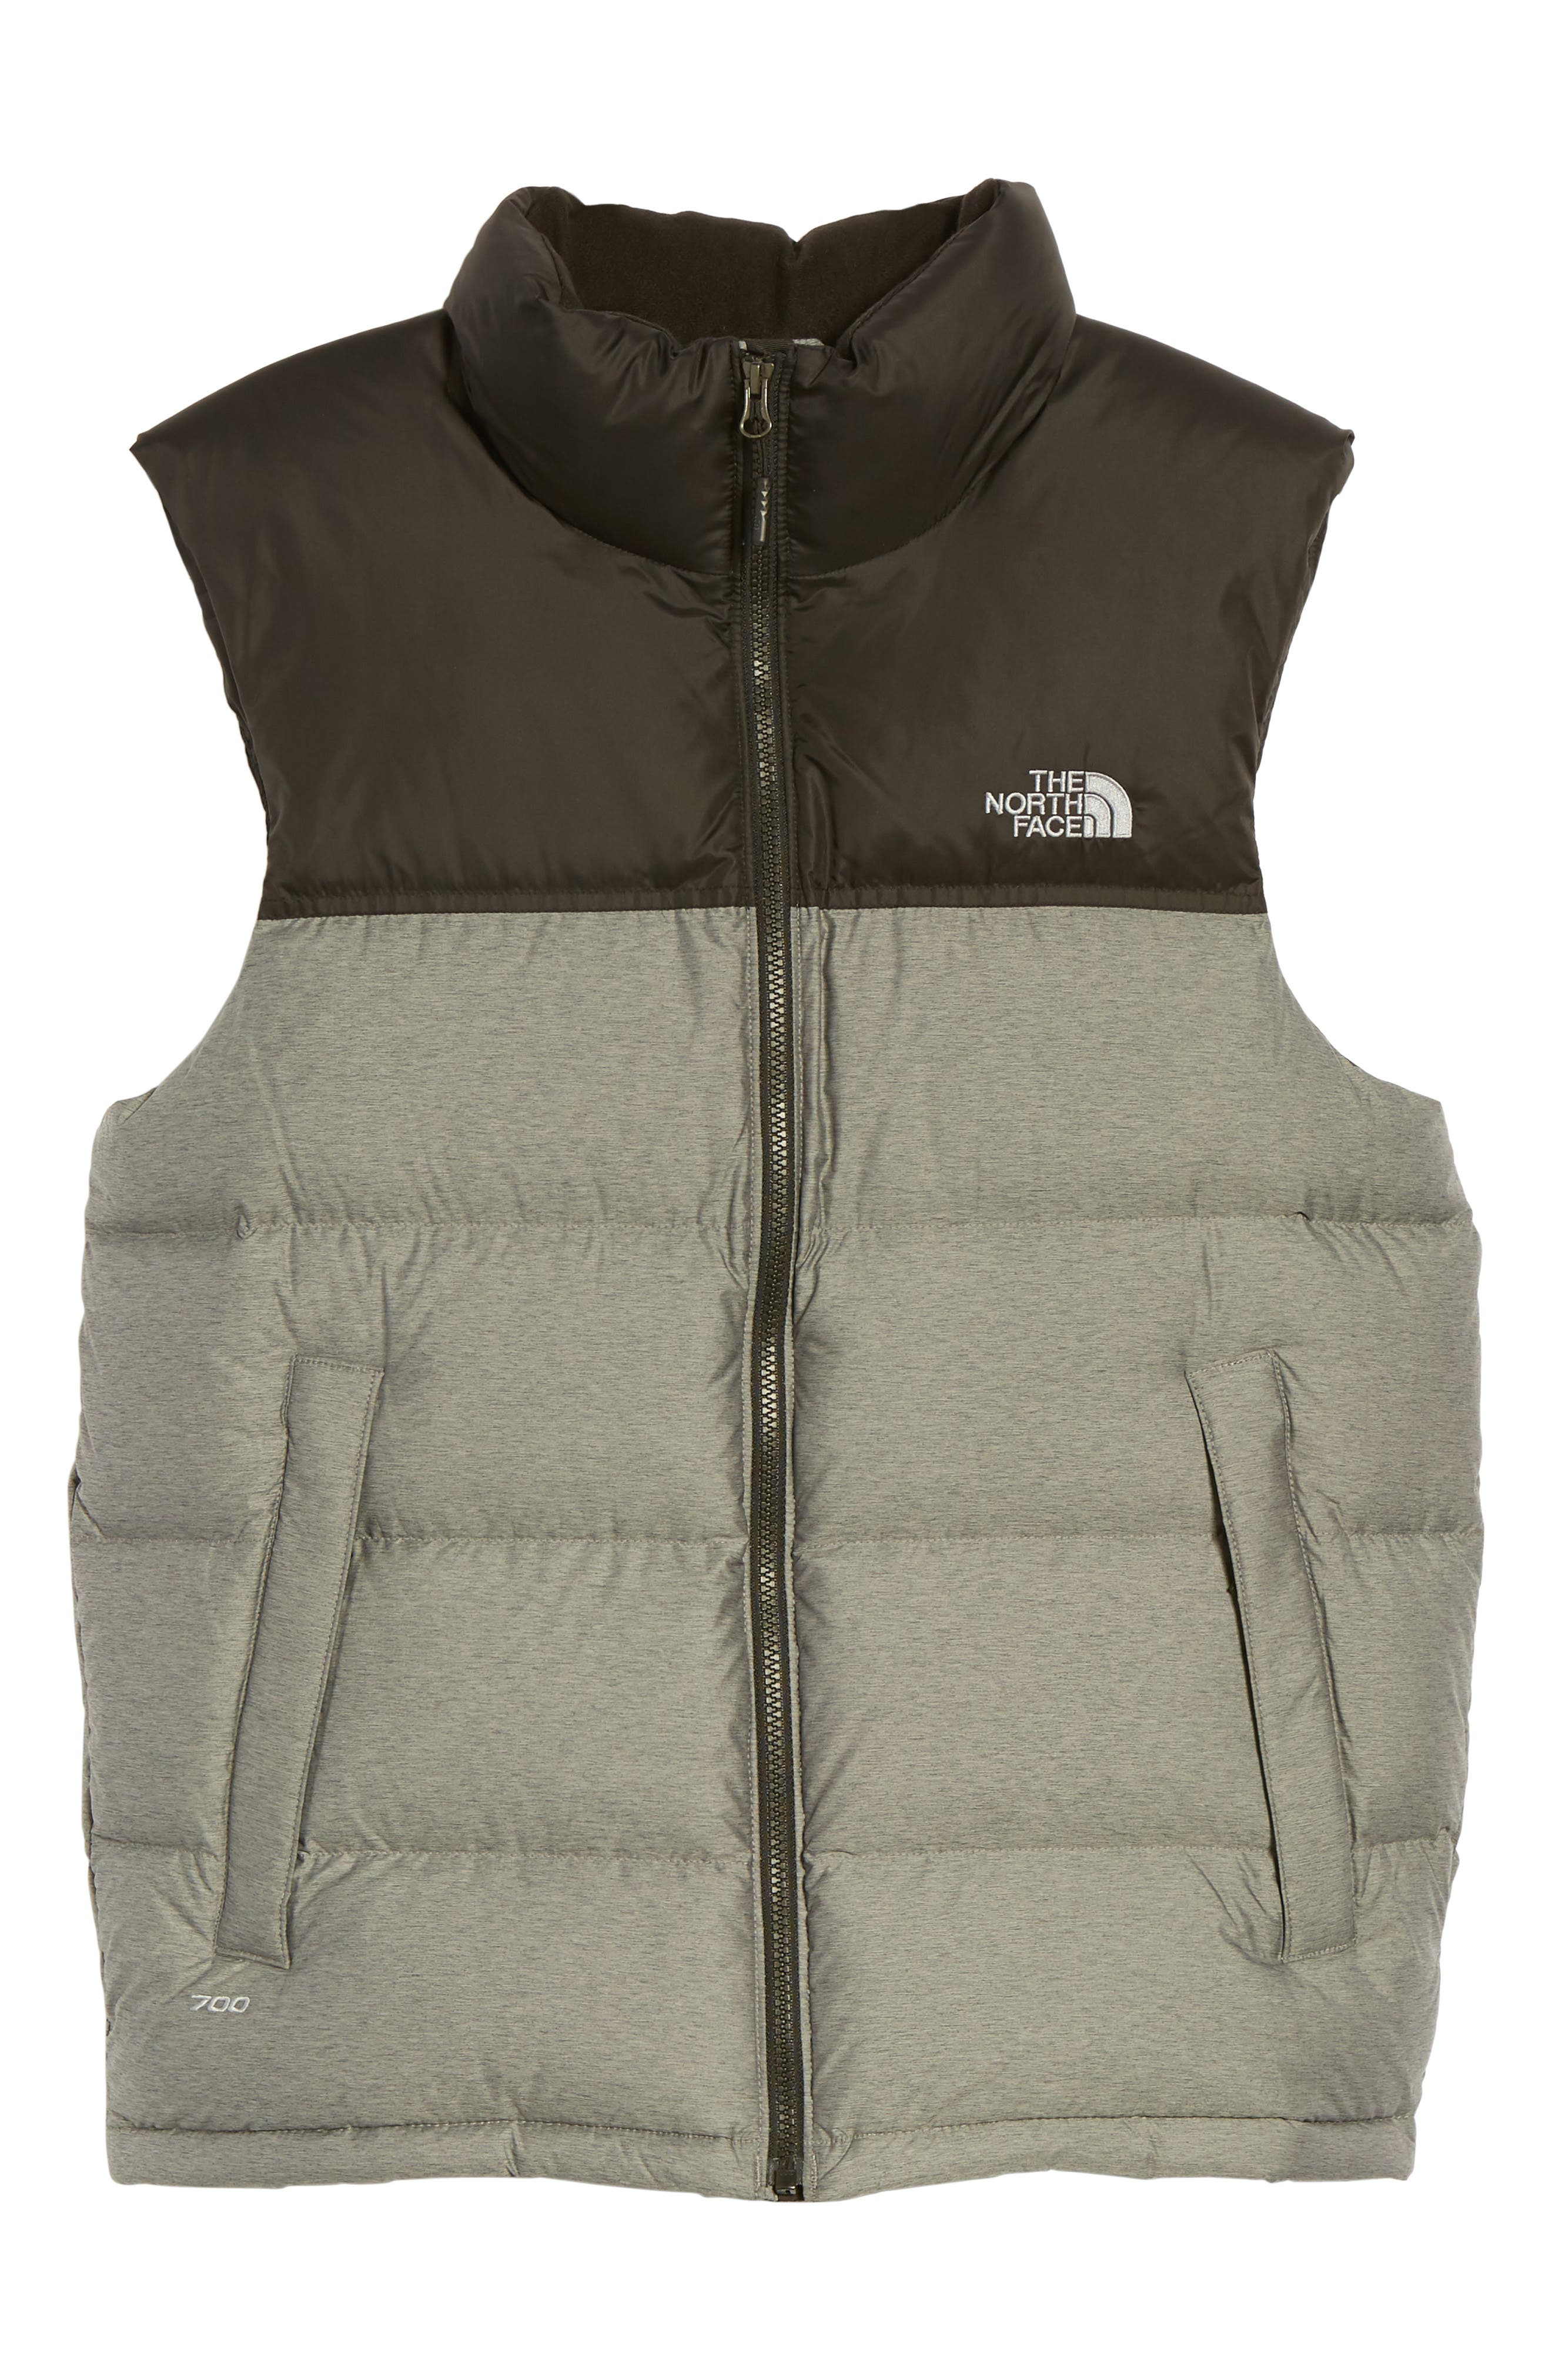 Nuptse Water Repellent Down Vest,                             Main thumbnail 1, color,                             Medium Grey Heather/ Black